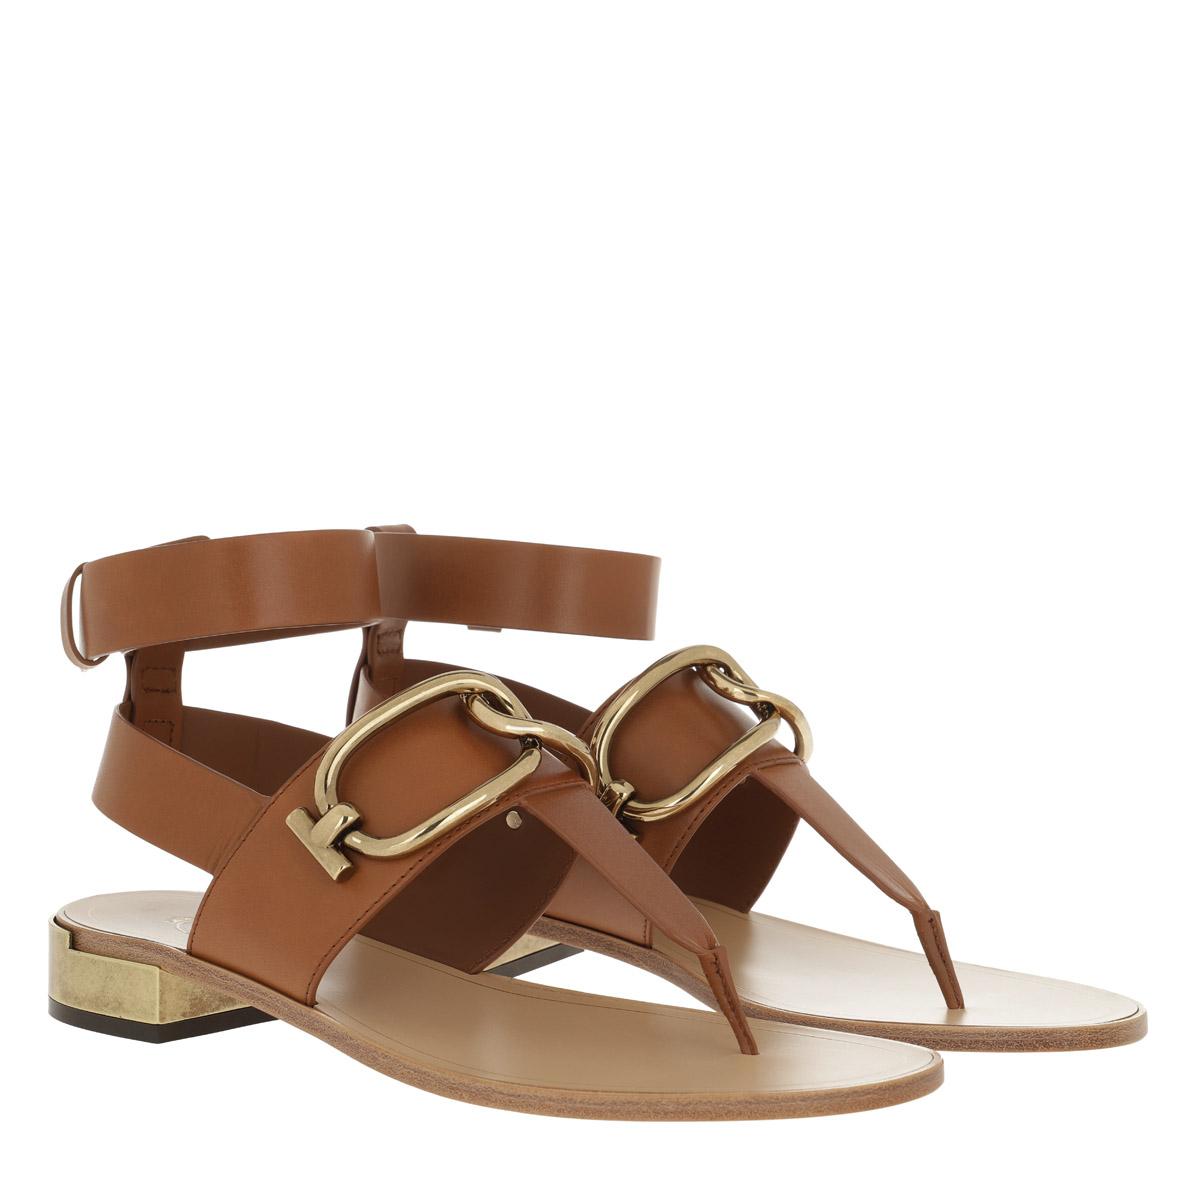 online store 46167 dfc54 Tod's Sandalen - T-Bar Sandals Cognac - in cognac - für Damen